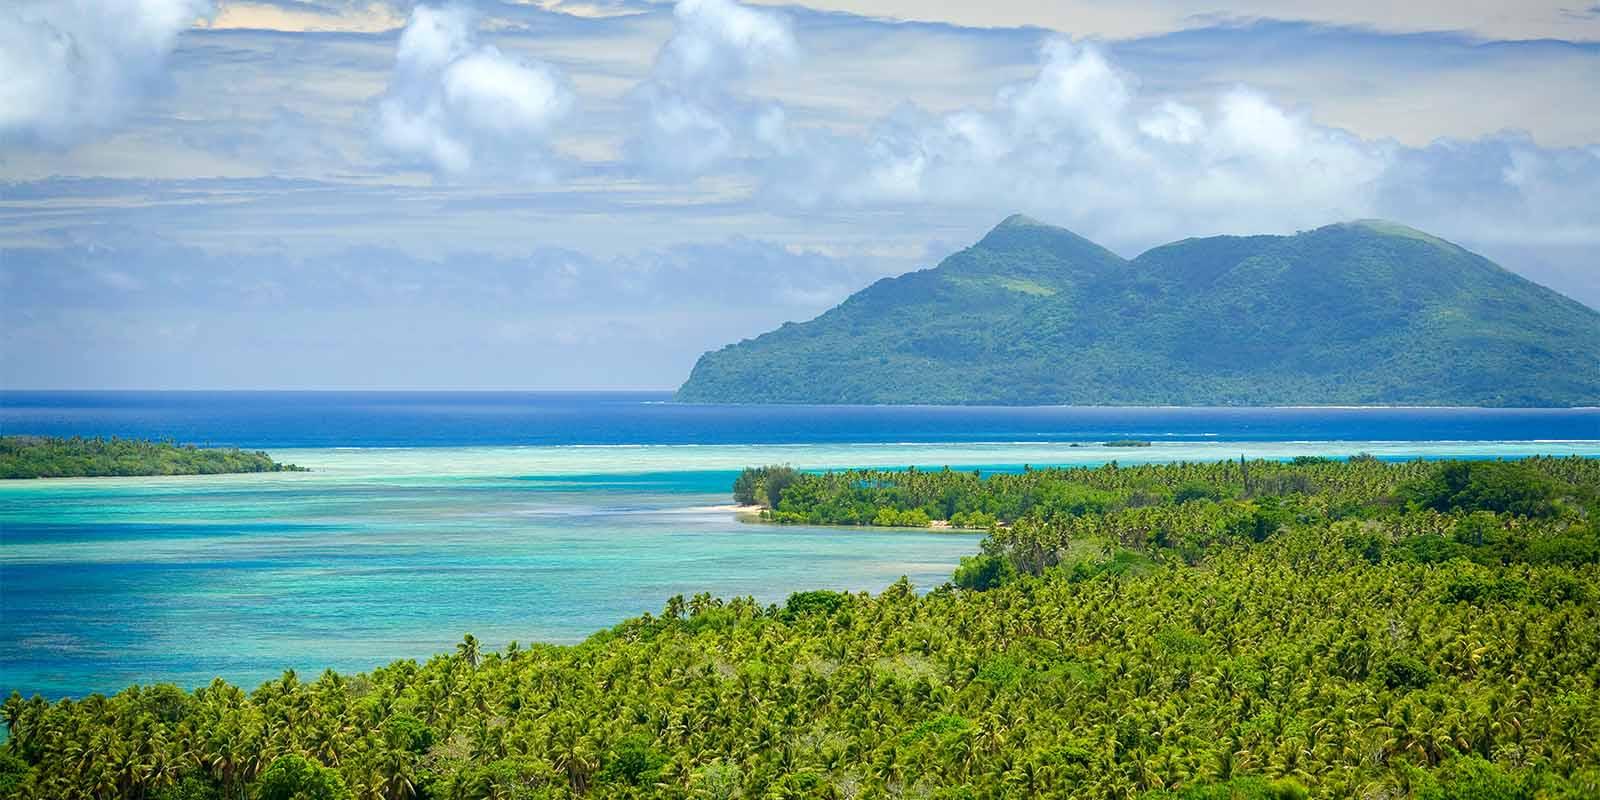 Aerial view of Vanuatu islands